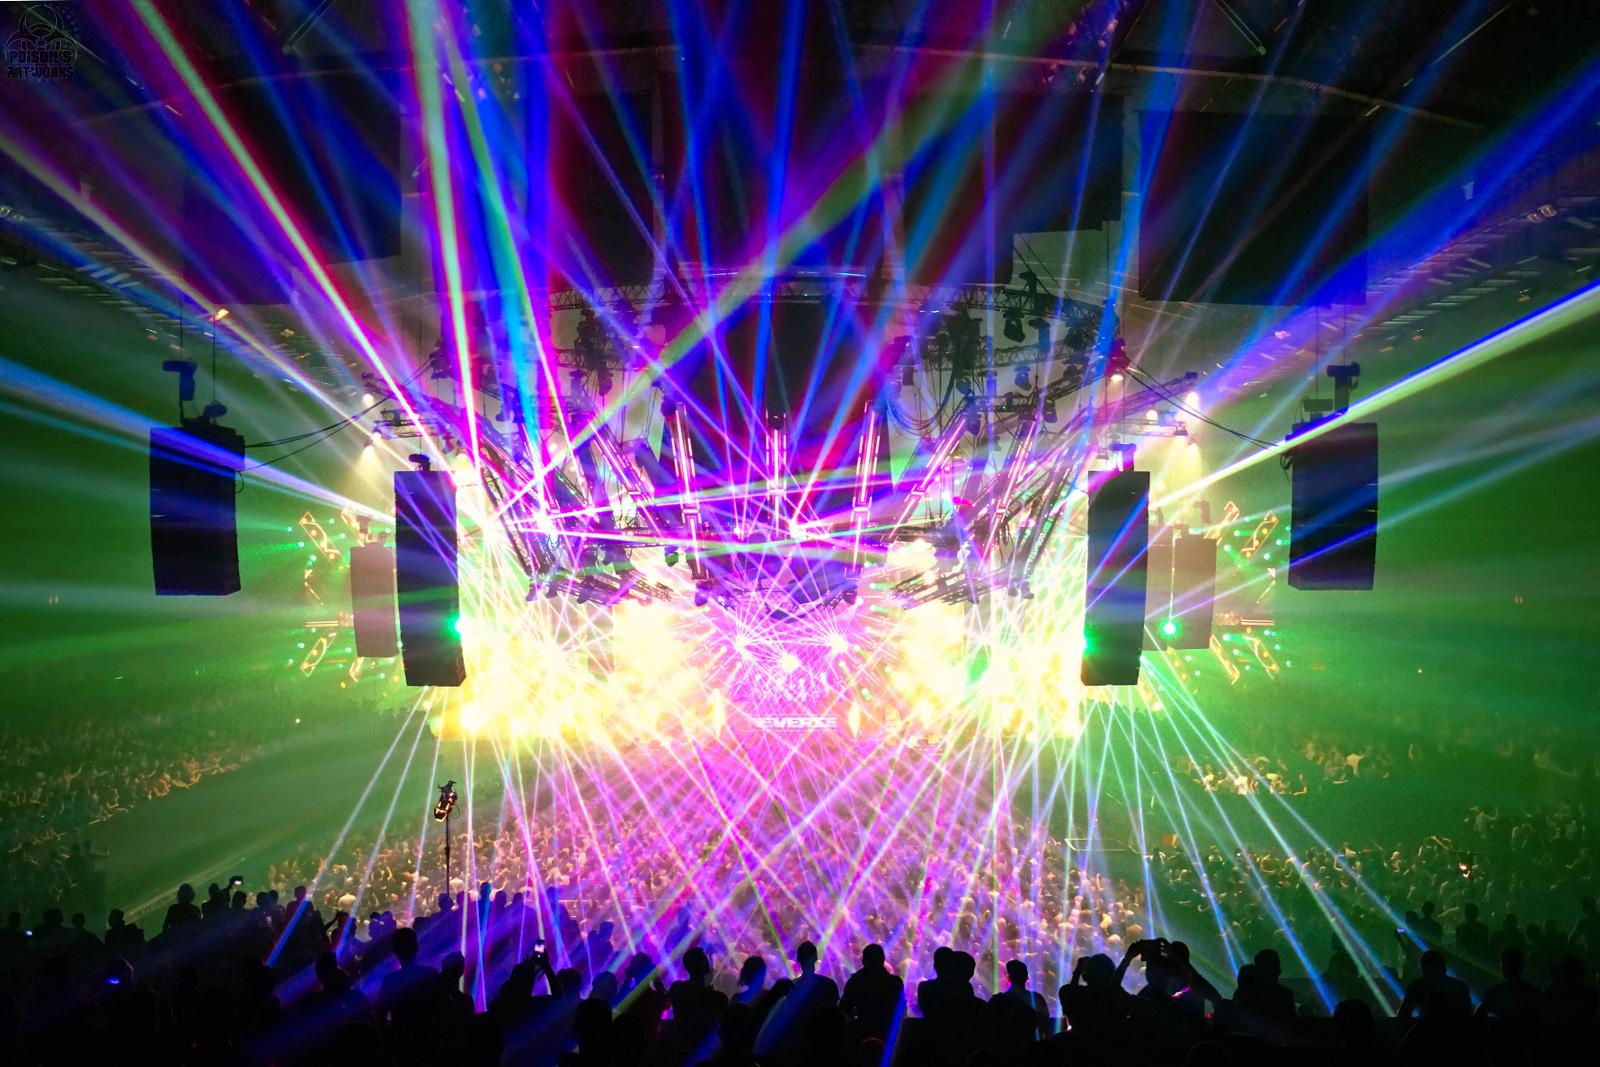 REVERZE - 7 Mars 2020 - Sportpaleis/Lotto Arena - Anvers - BE Dsc04810